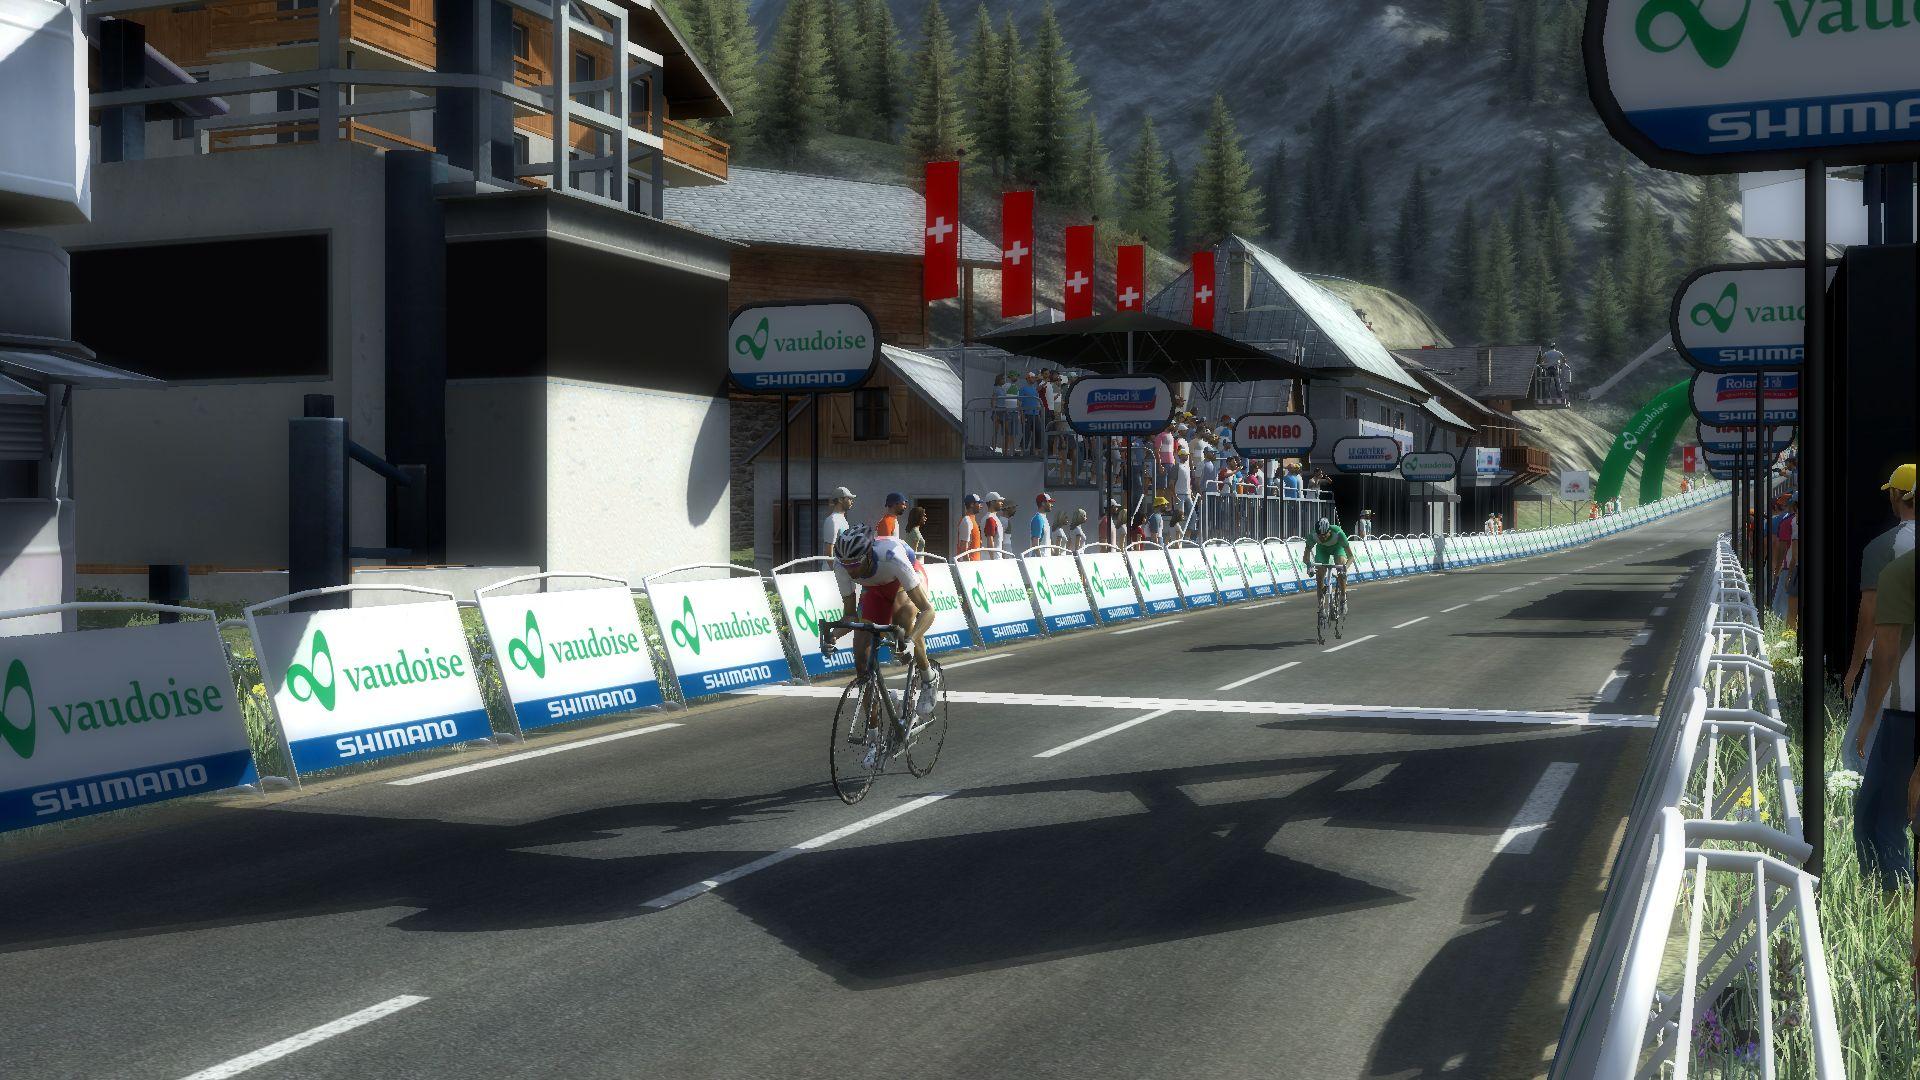 pcmdaily.com/images/mg/2017/Races/U23/Avenir/AVES7%2029.jpg